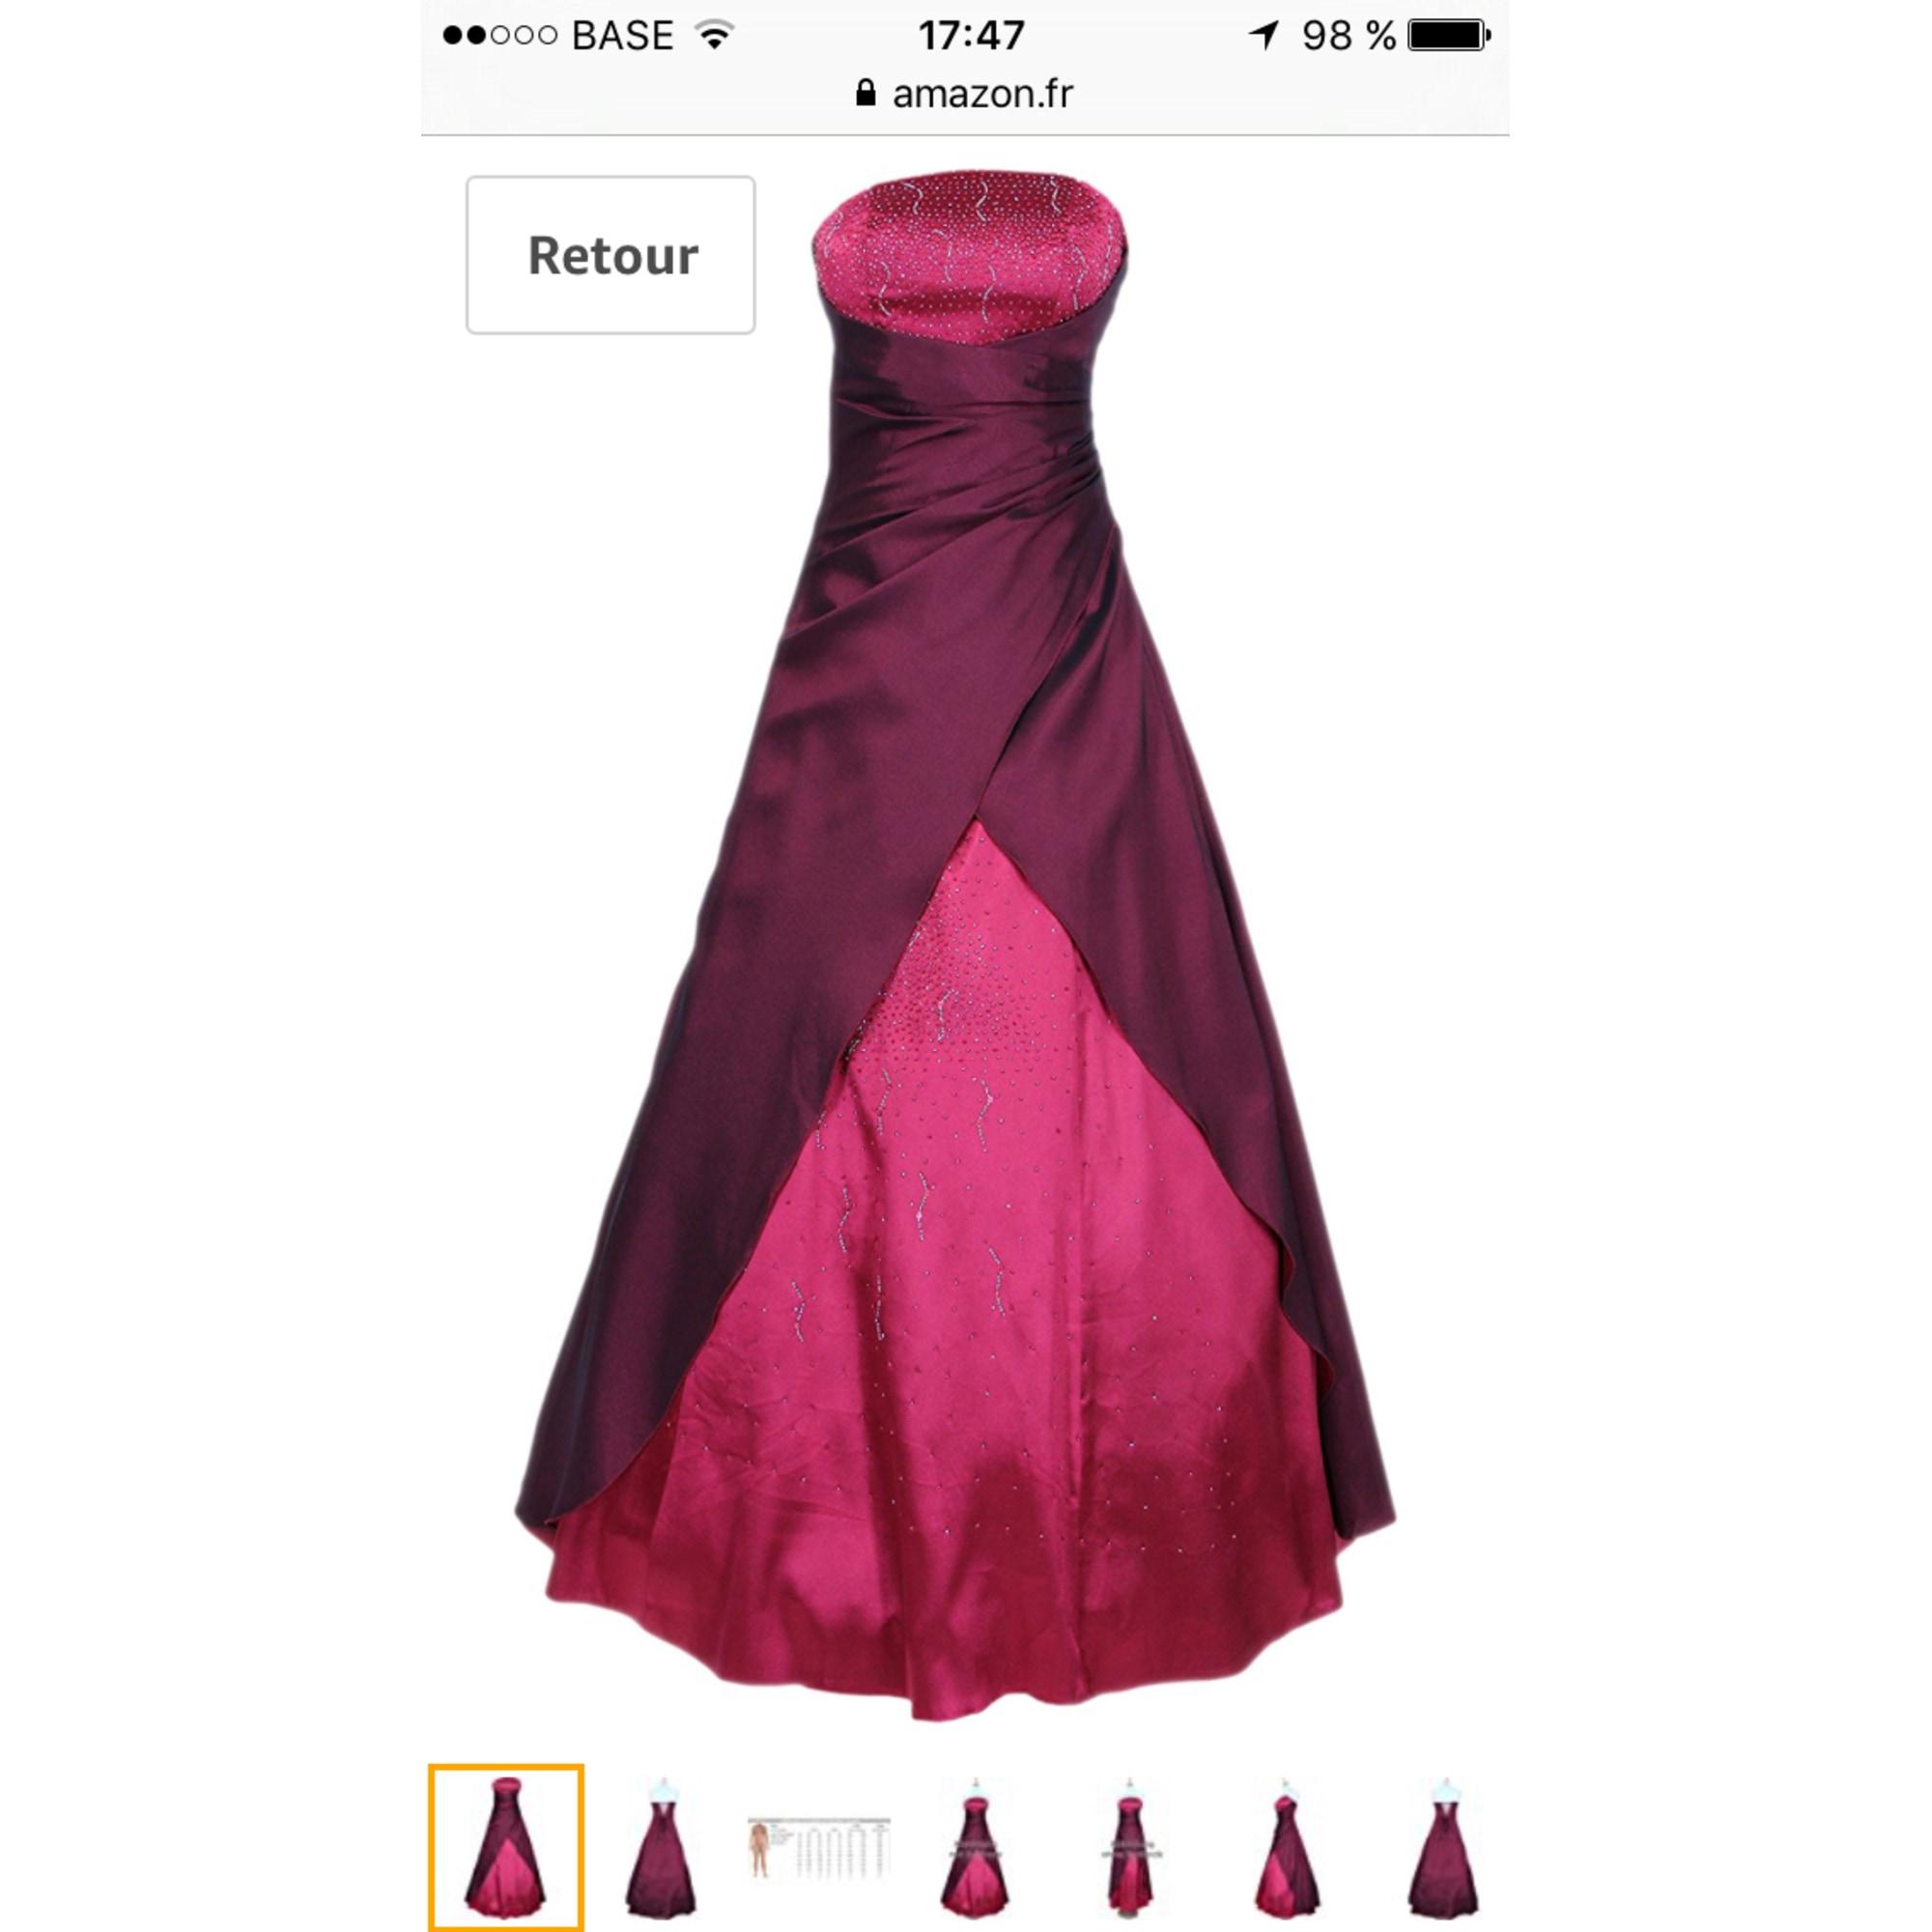 d2c68cb94dd5 Robe longue JUJU   CHRISTINE 38 (M, T2) rouge - 6206099